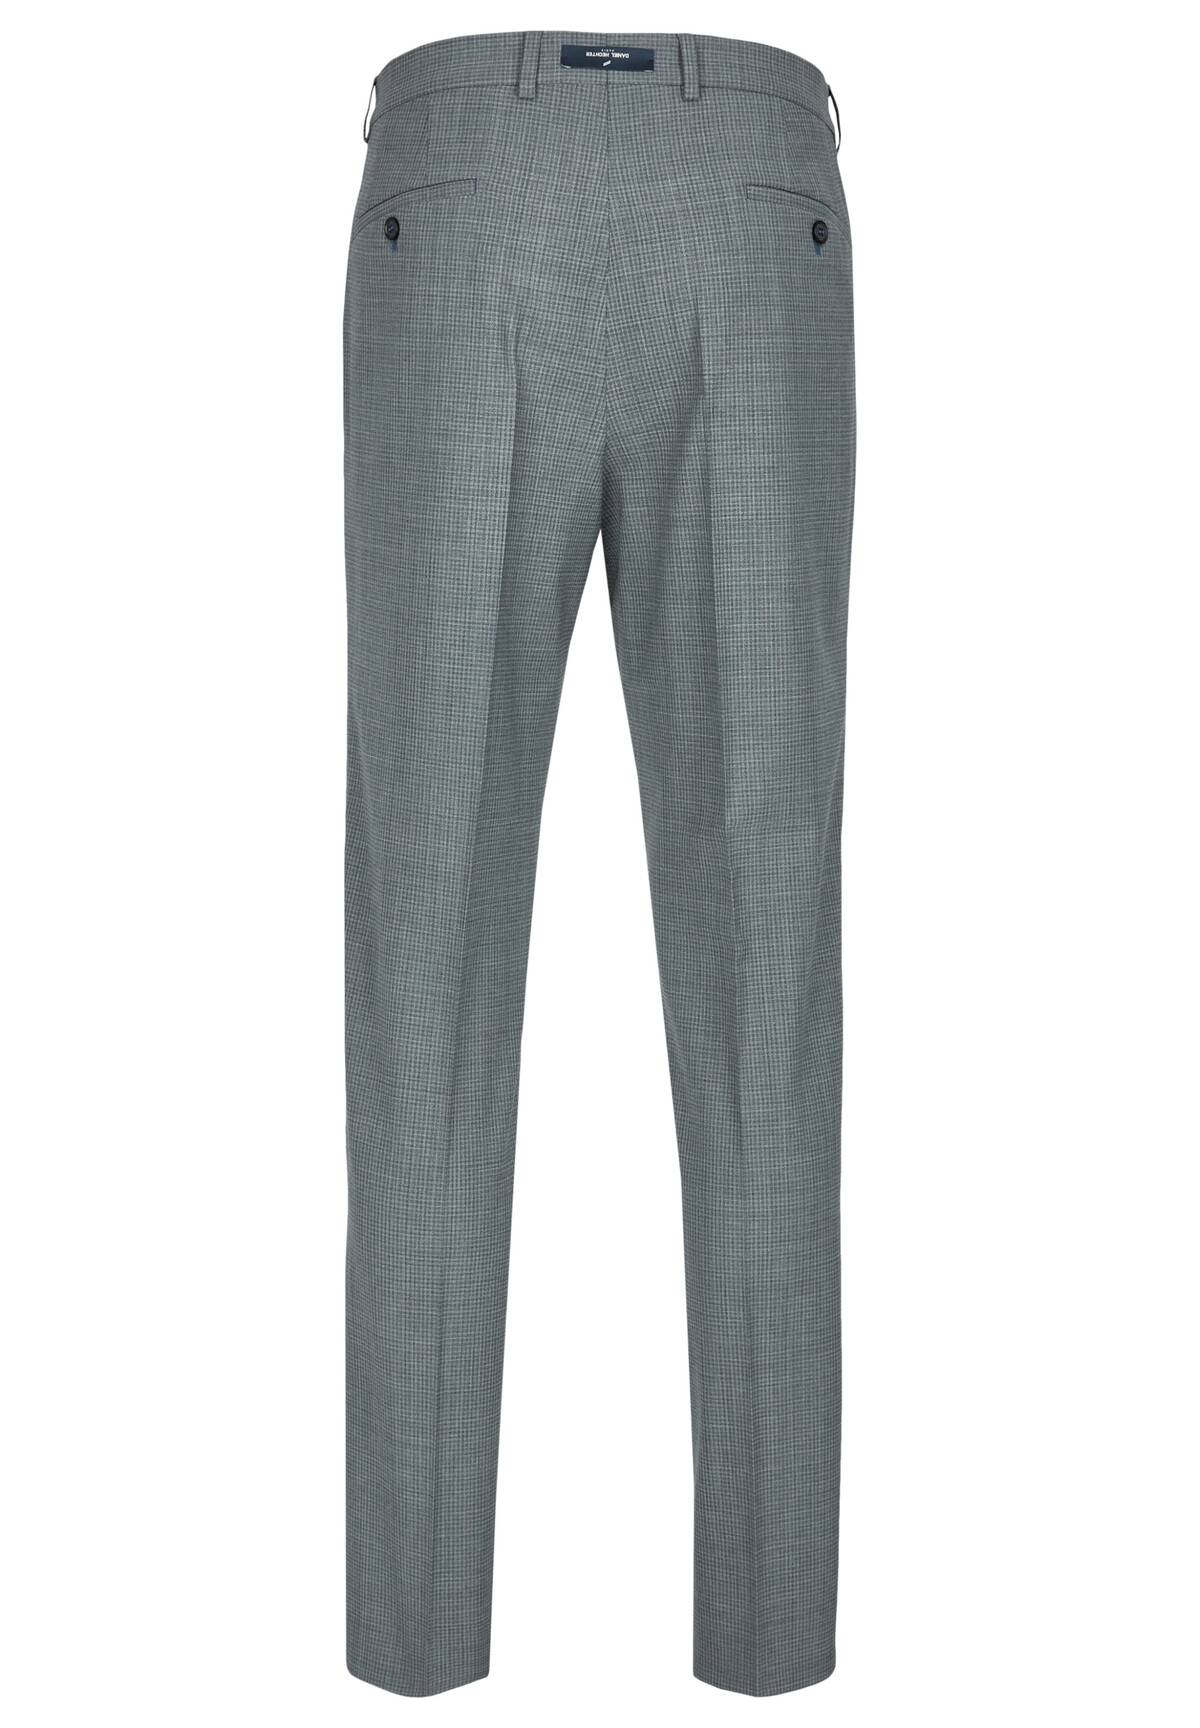 DH-XTENSION Modern Fit Anzug Hose / DH-XTENSION Modern Fit Anzug Hose